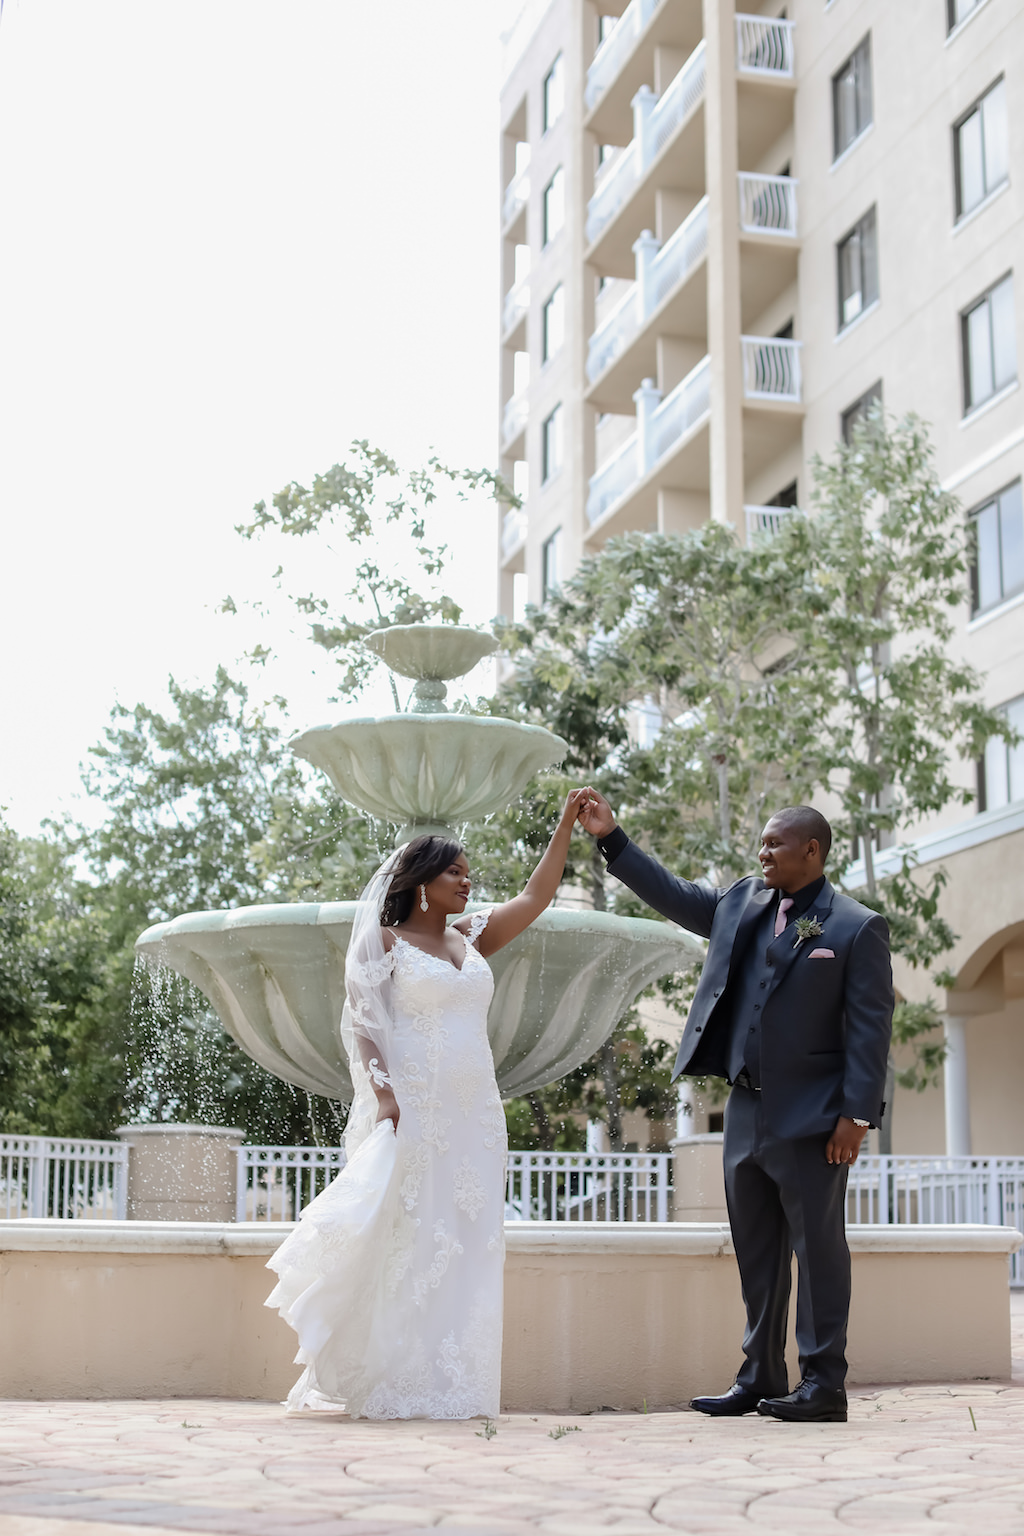 Florida Bride and Groom Outdoor Fountain Wedding Portrait | Tampa Wedding Photographer Lifelong Photography Studio | Wedding Dress Boutique Truly Forever Bridal | Largo Wedding Venue Bayou Club